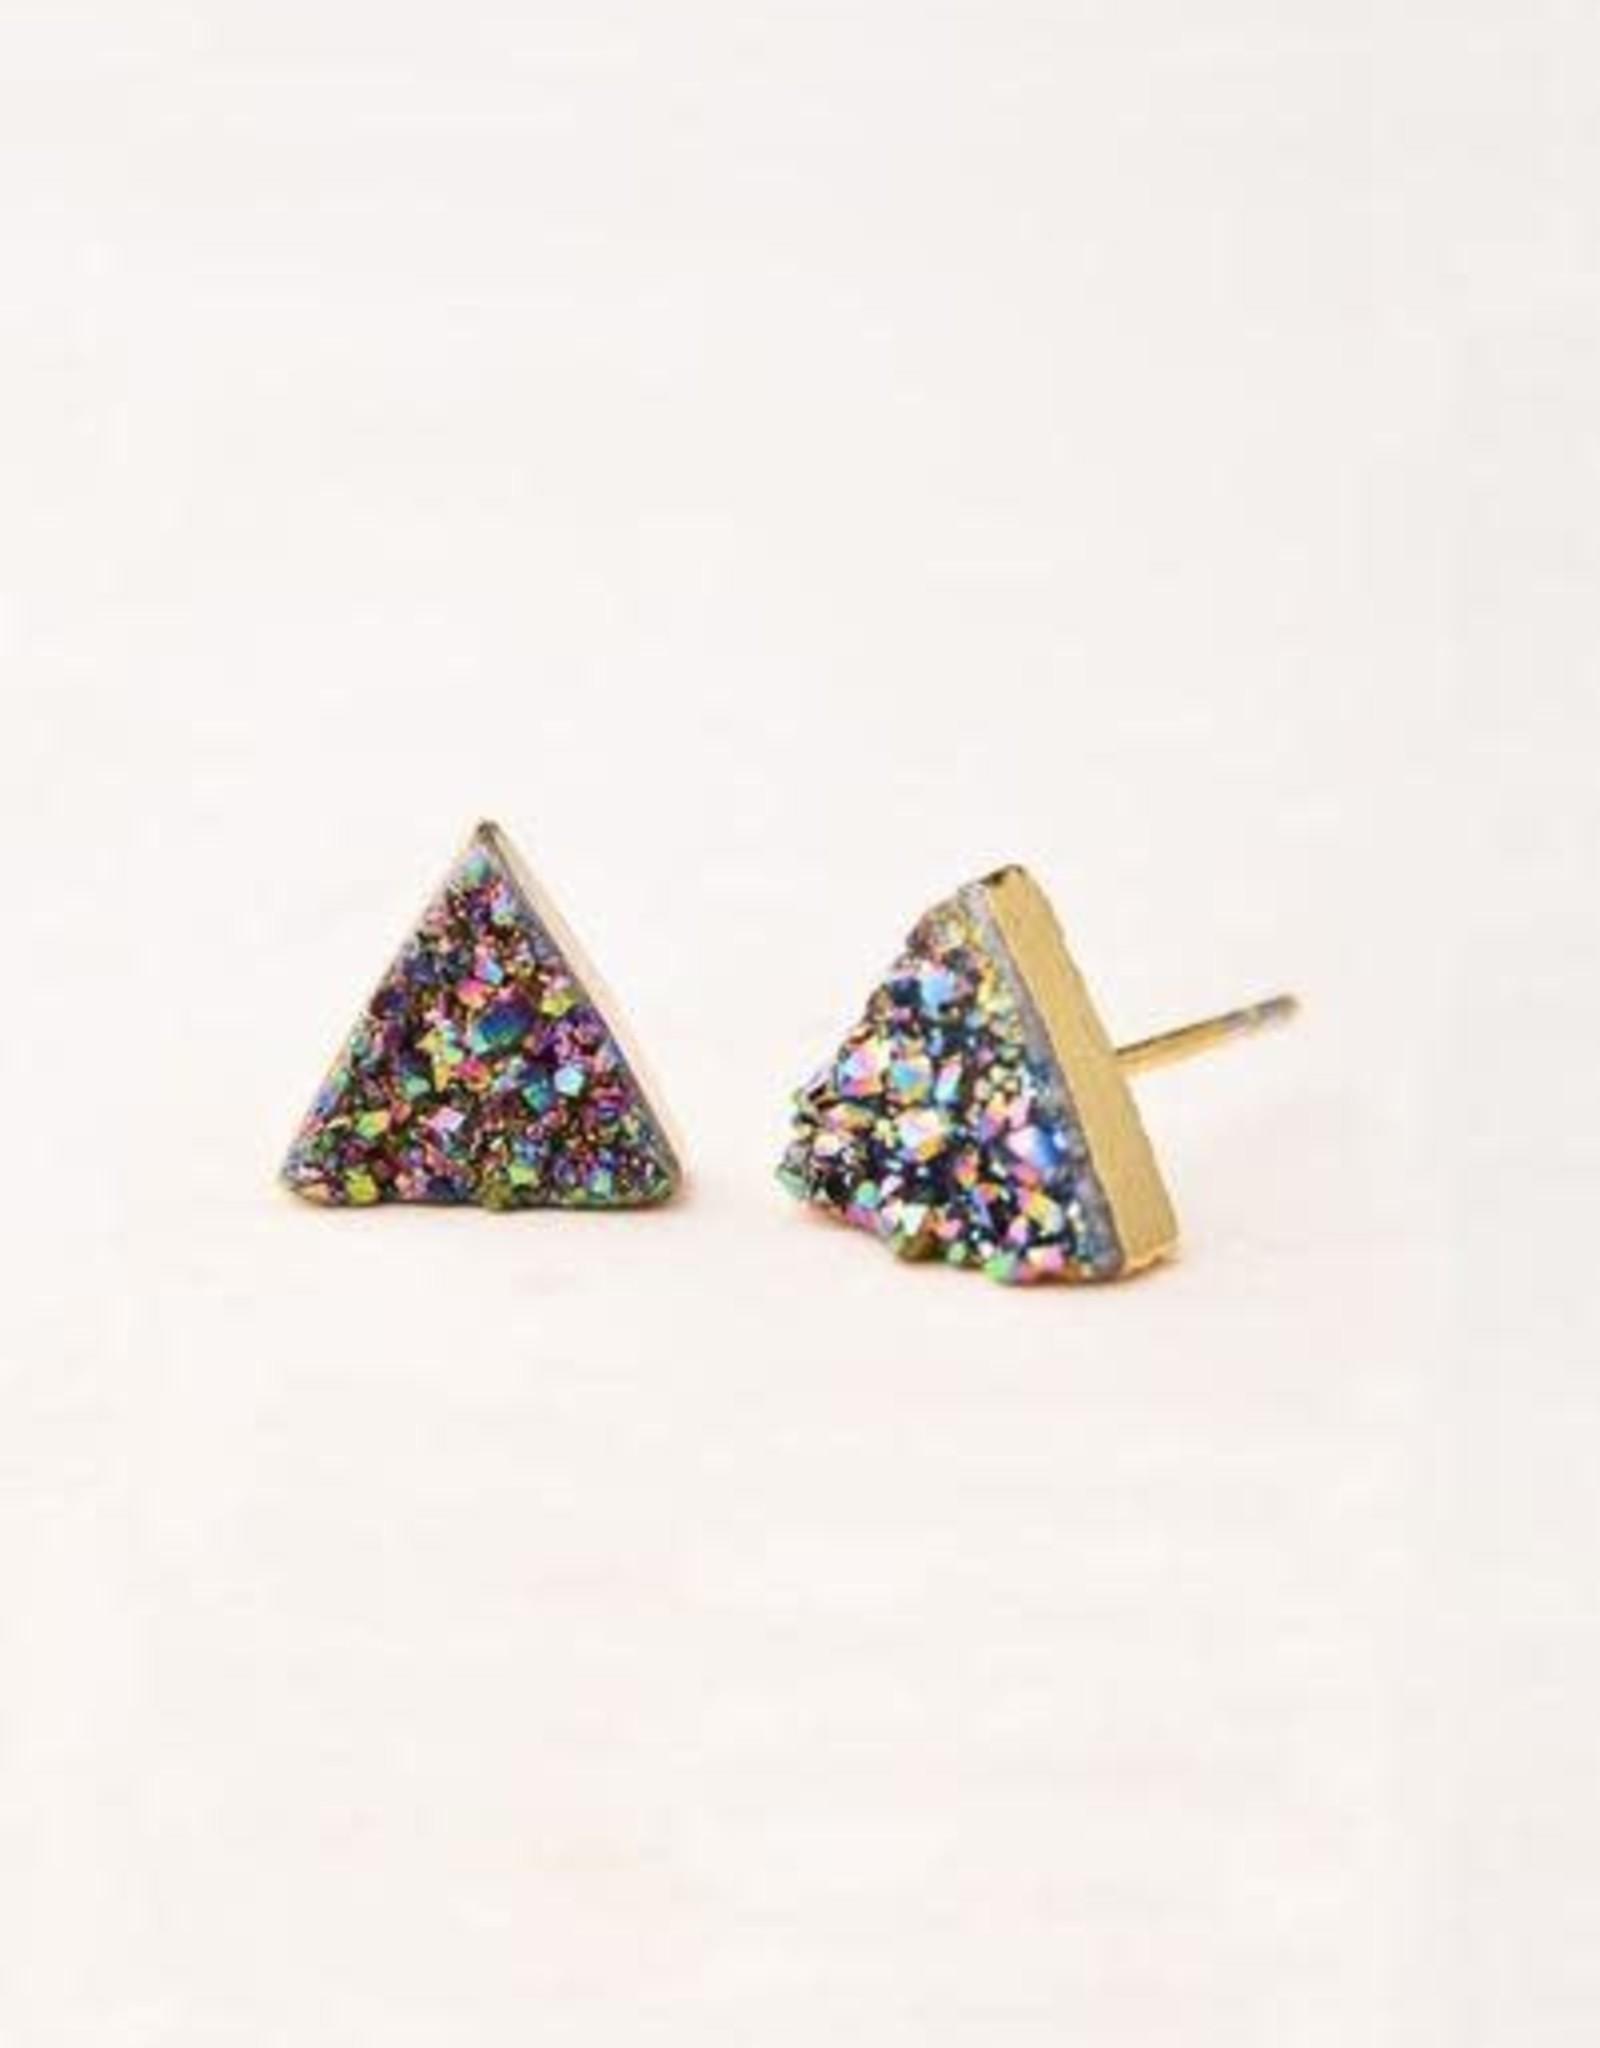 Kyra, Multicolored Druzy Stud Earrings